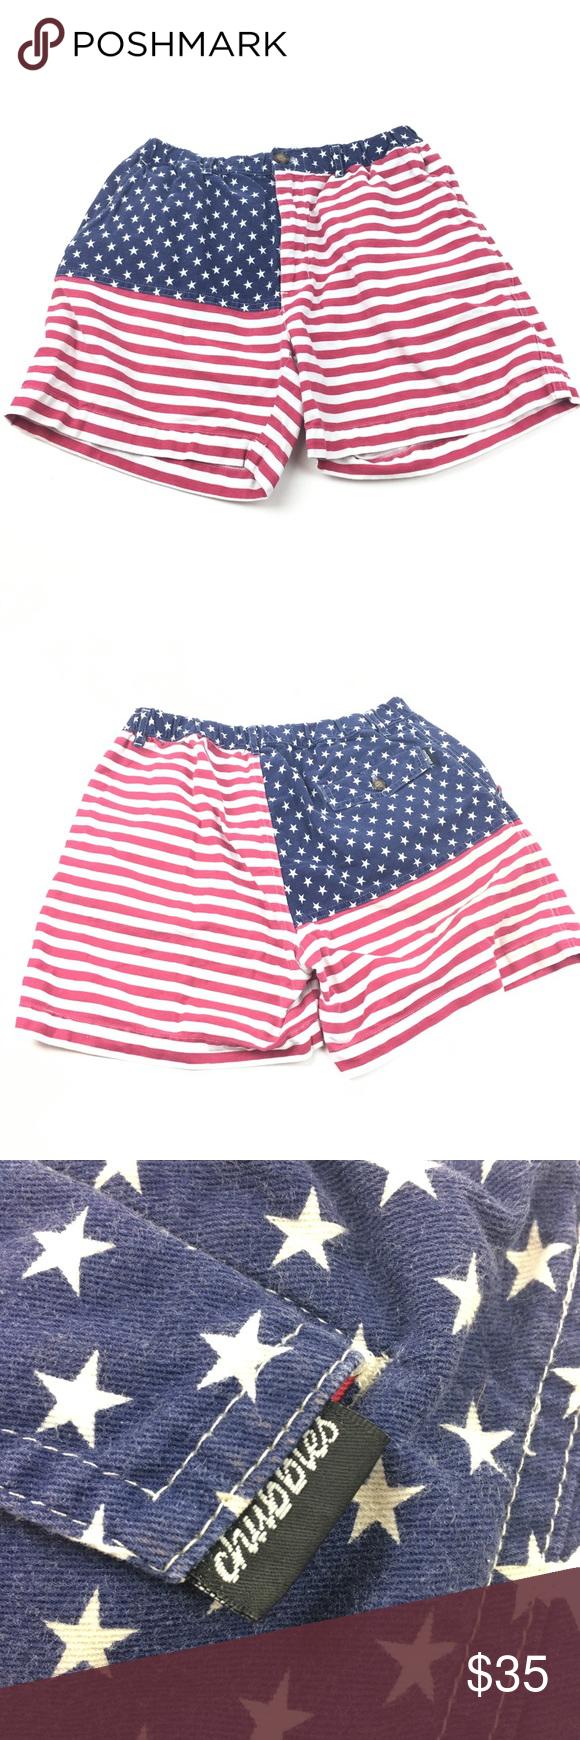 Chubbies American Flag Print Shorts American Flag Print Printed Shorts Chubbies Shorts